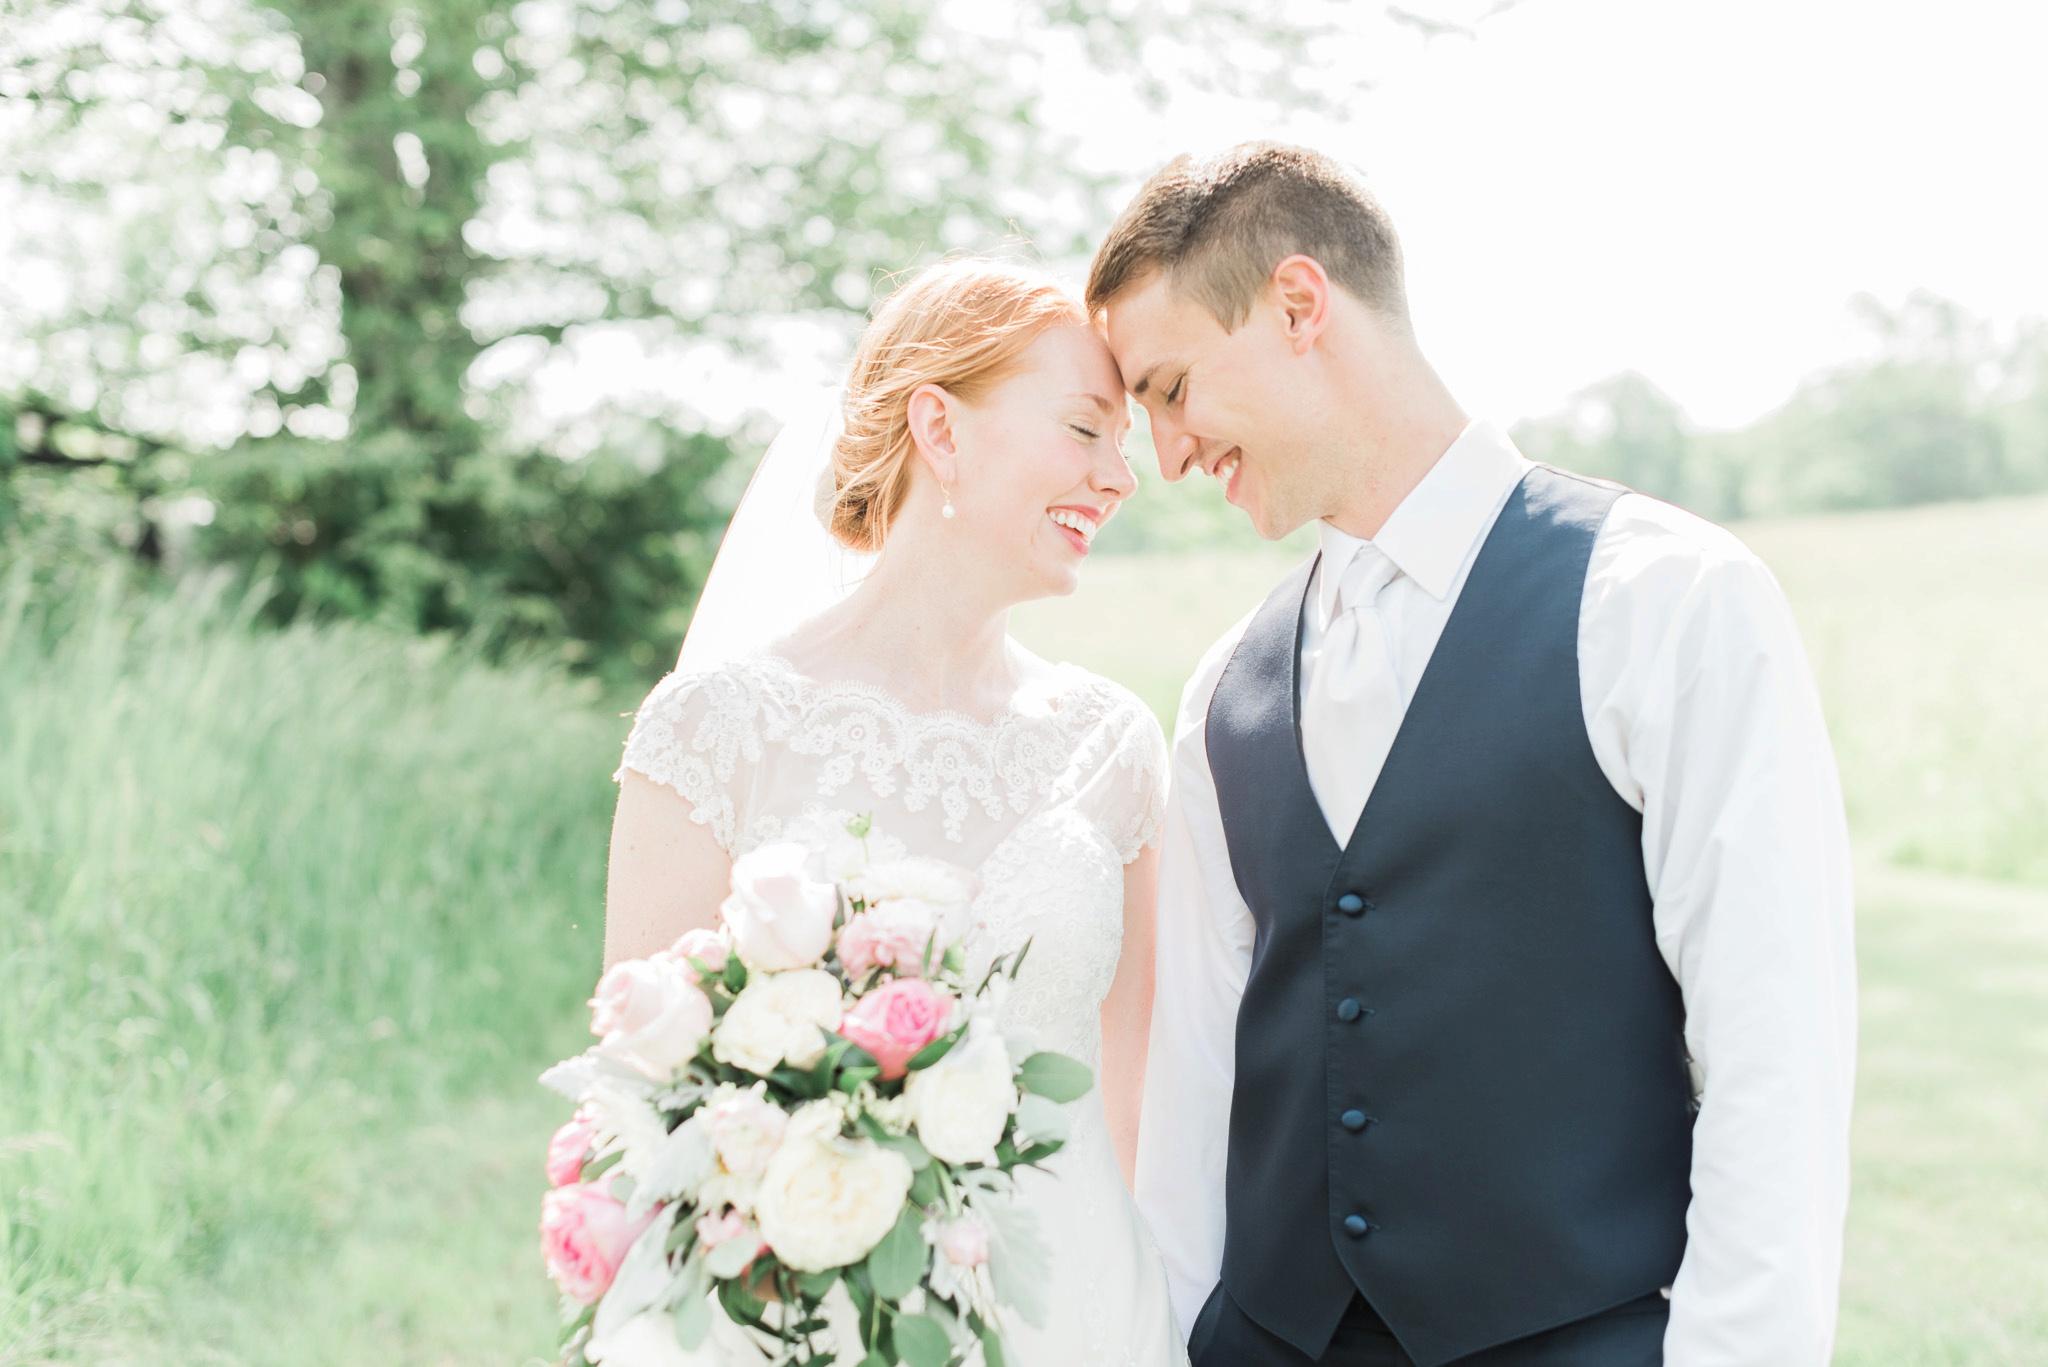 sunbury-ohio-wedding-hannah-johnathan_0096.jpg